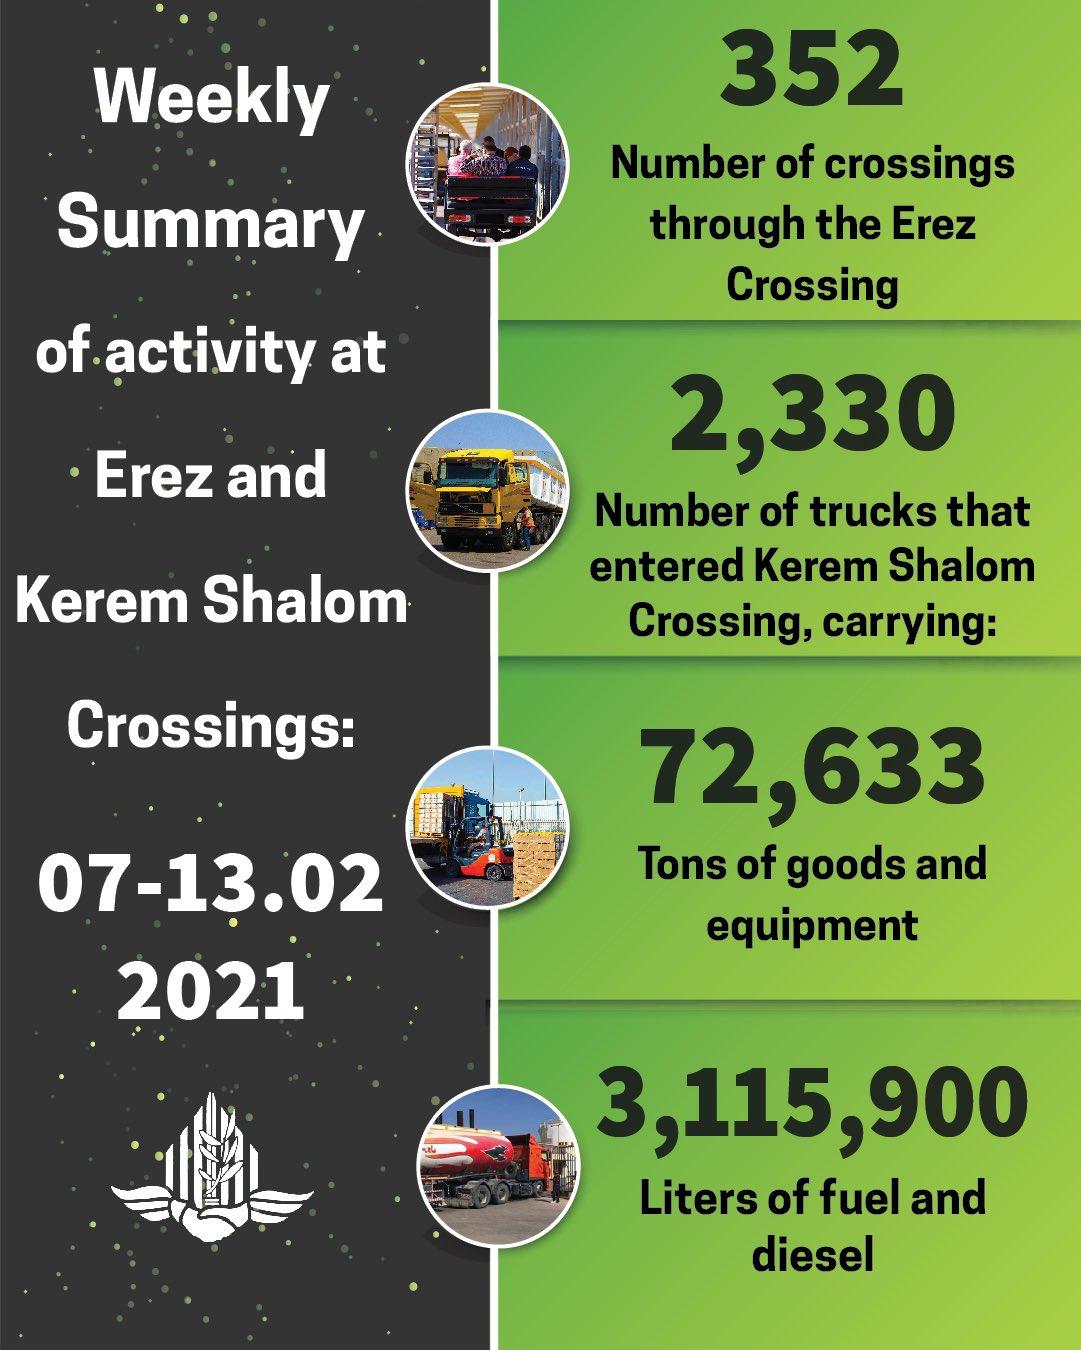 COGAT deliveries into Gaza